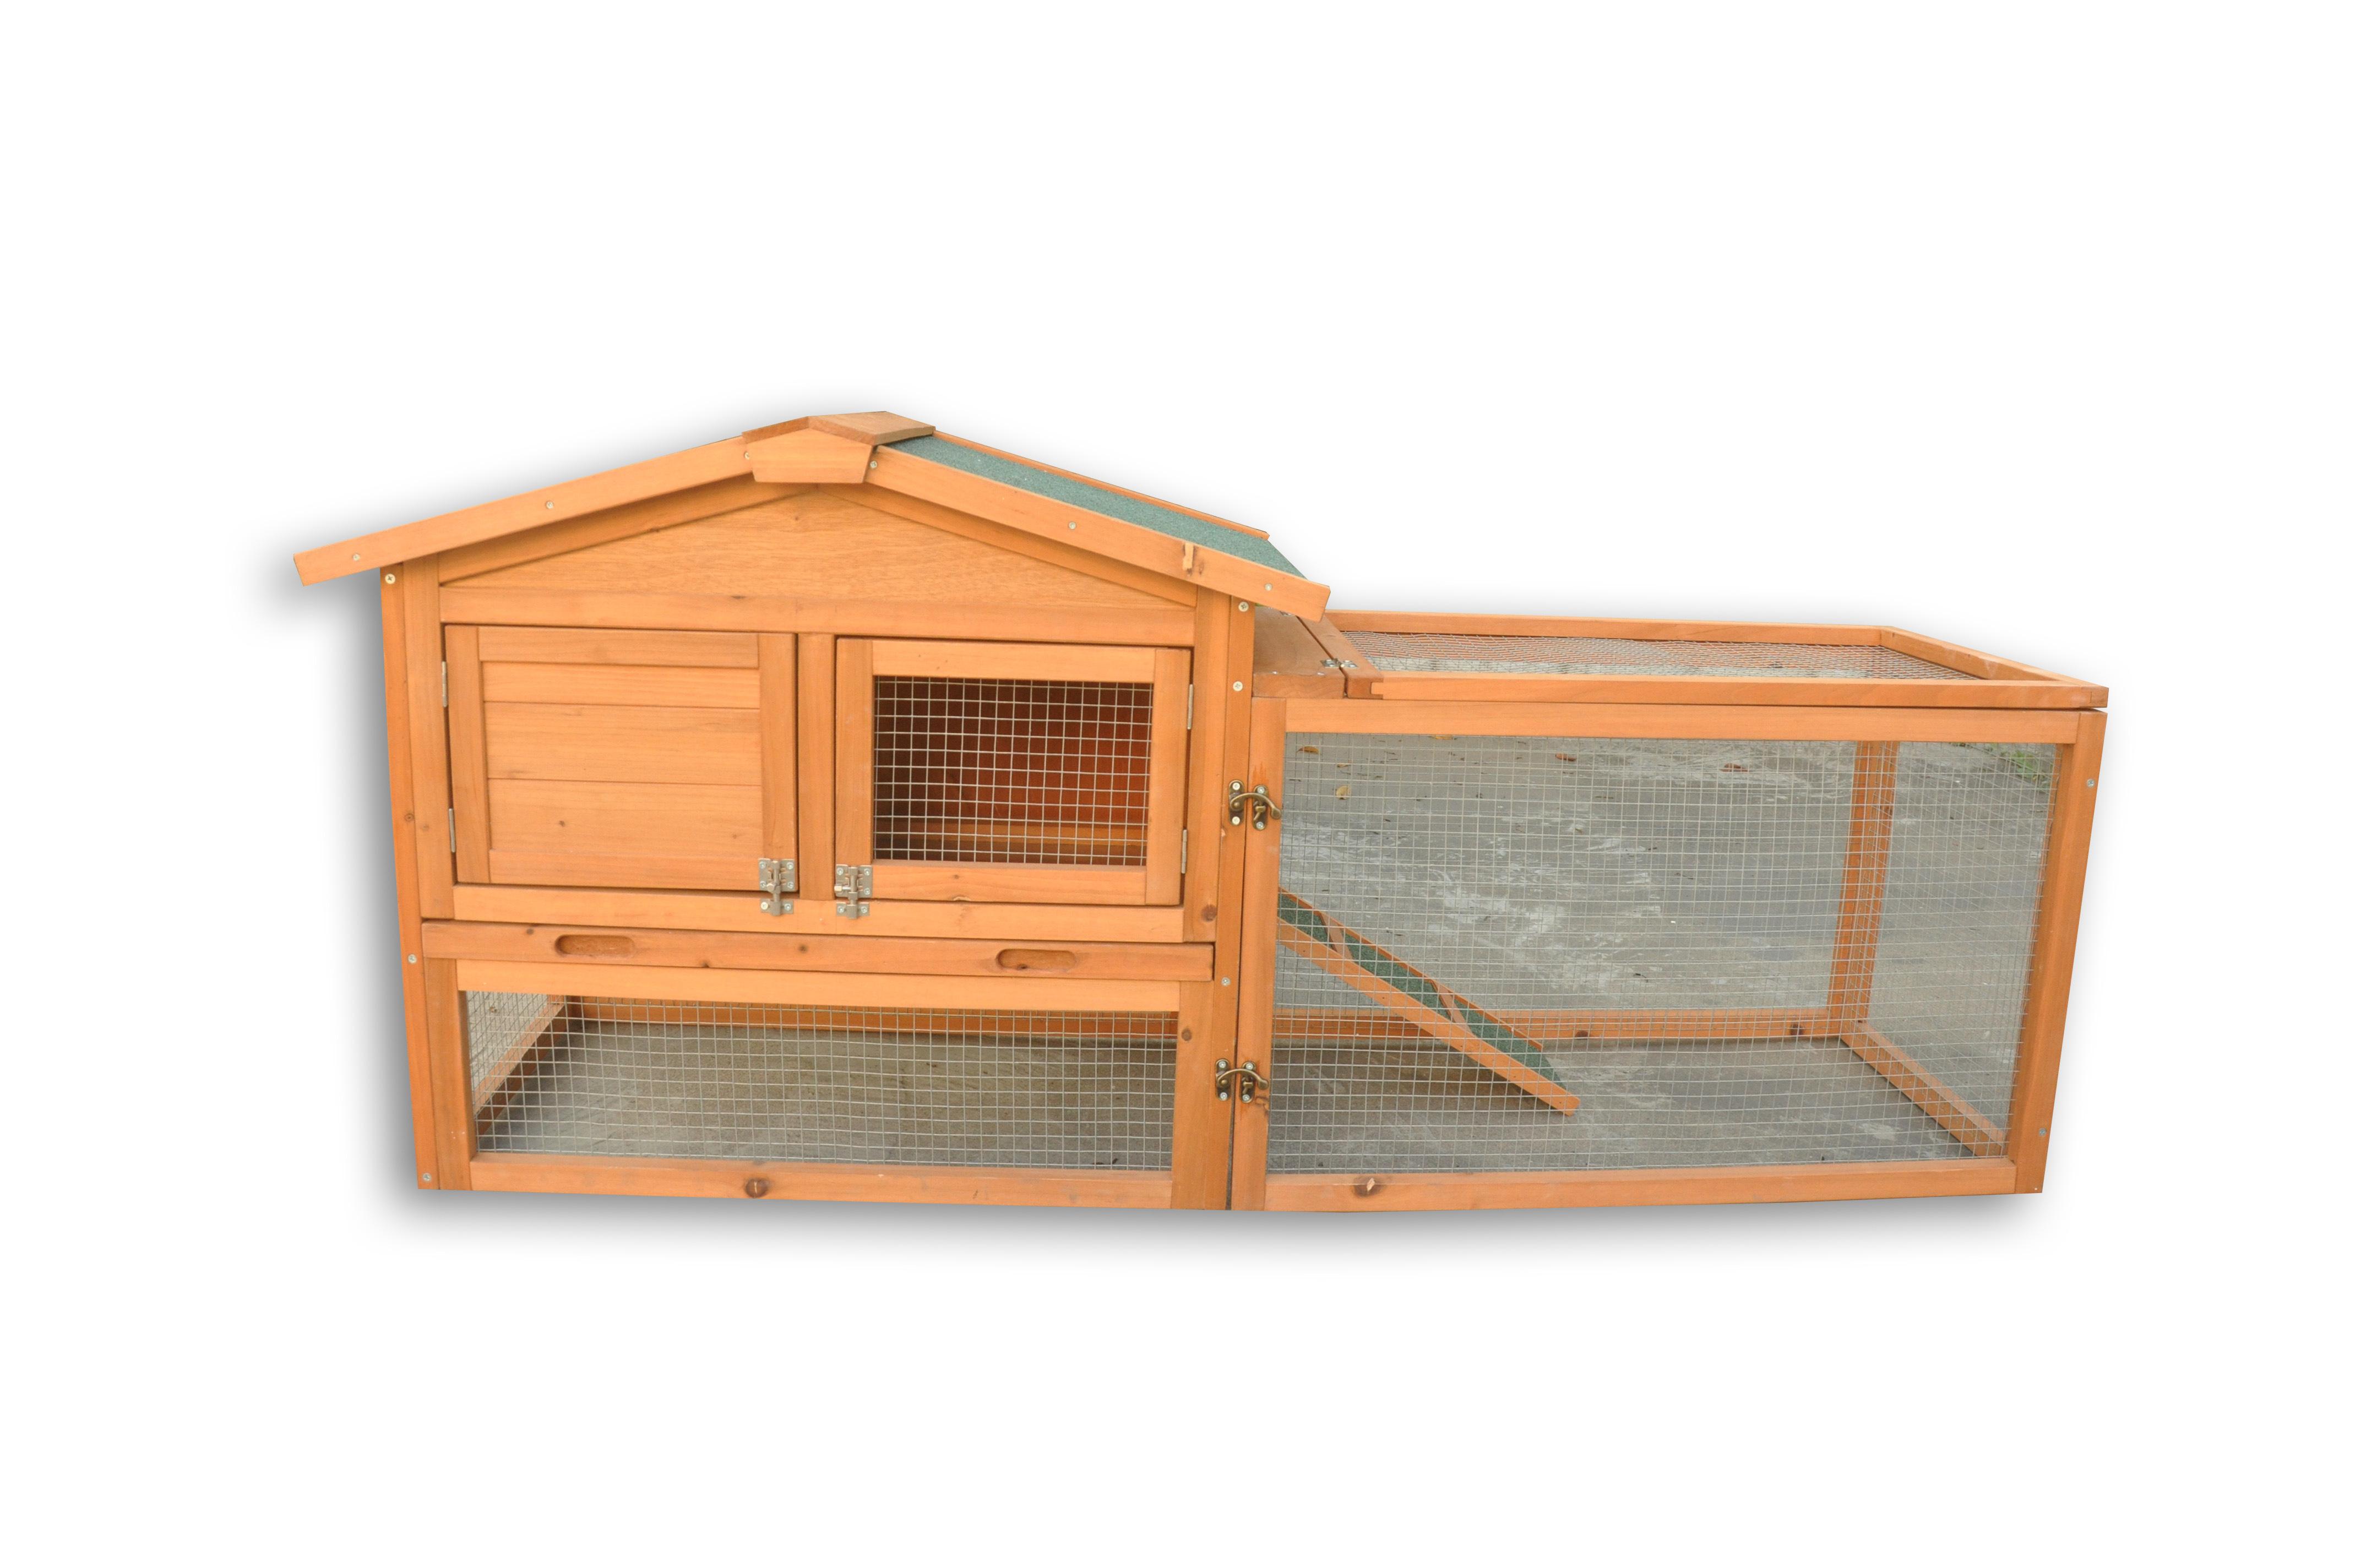 Hot Sale Outdoor Custom Handmade Rabbit Hutch Wooden Furniture ...